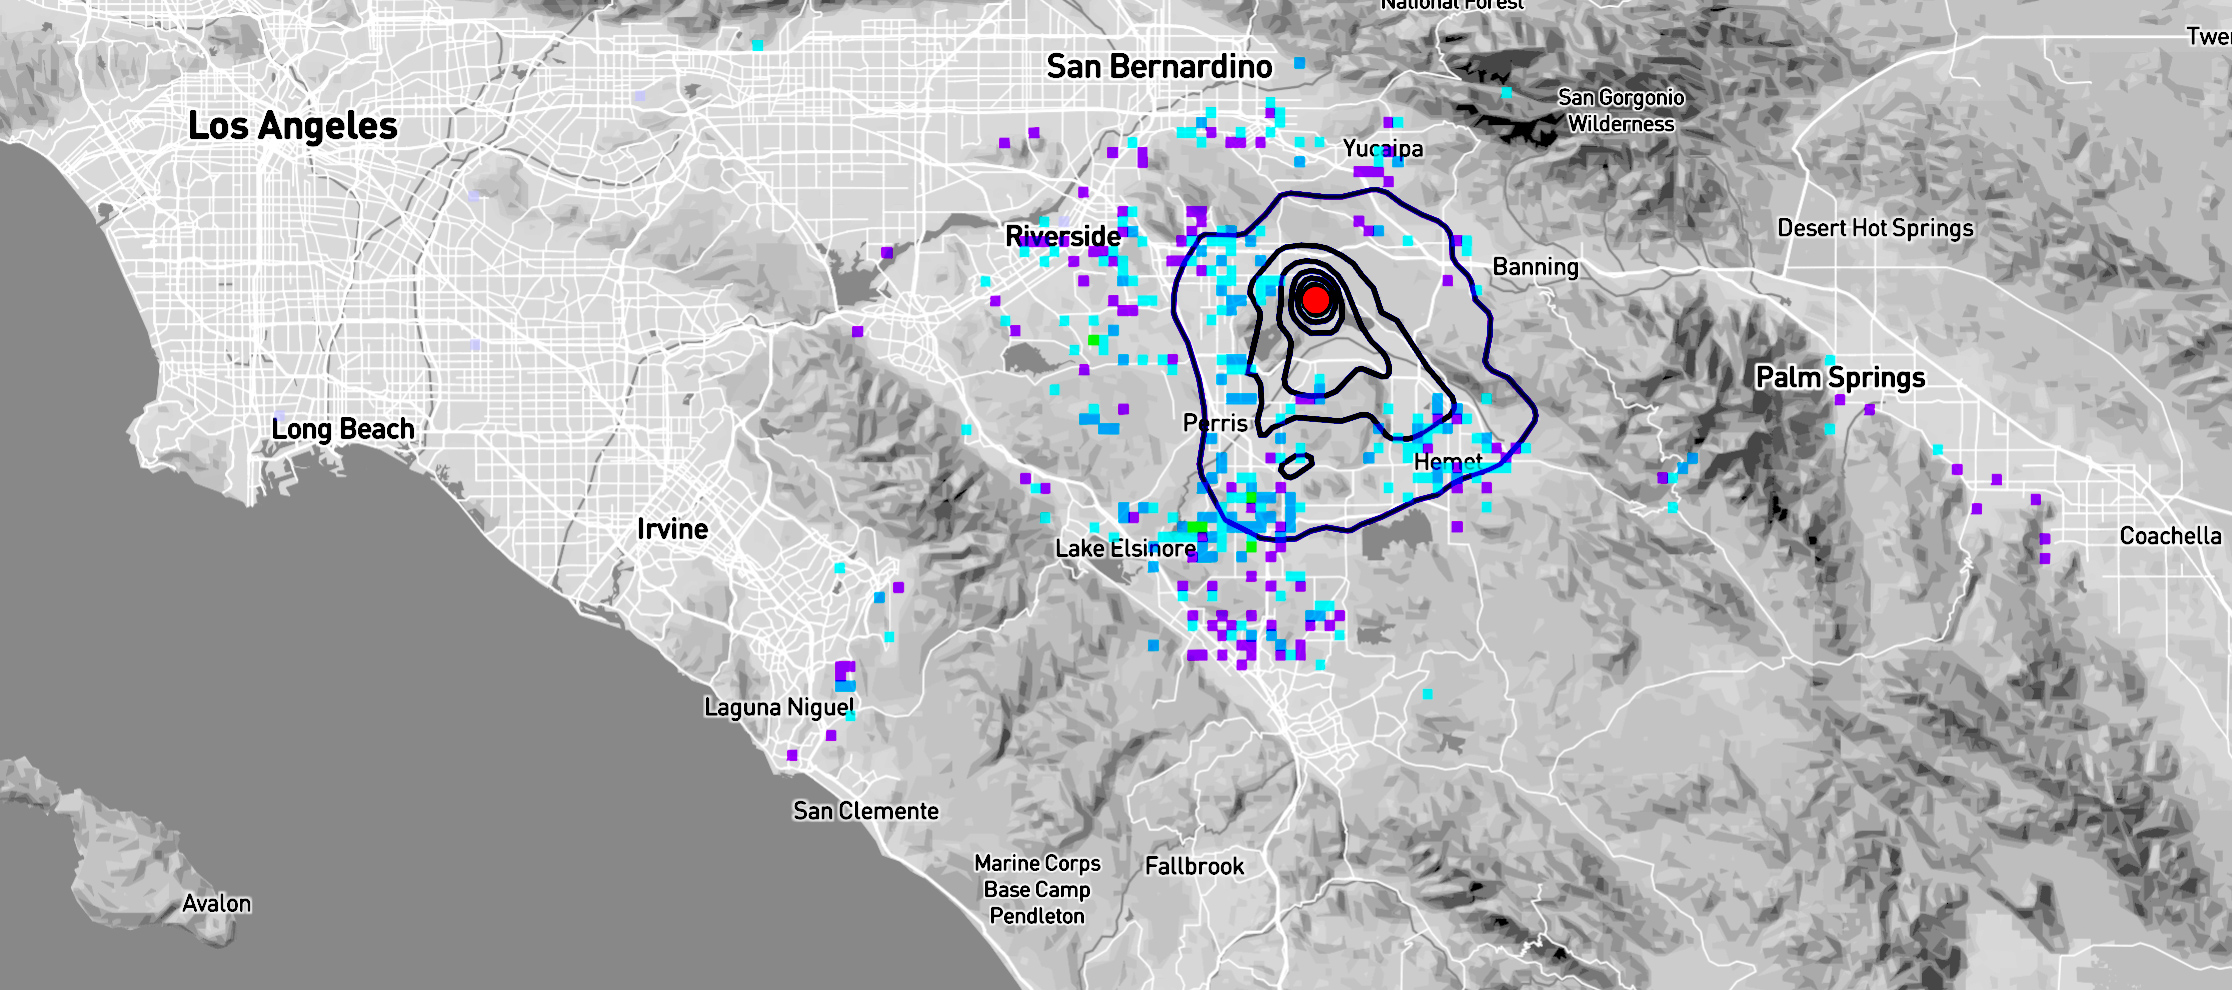 Magnitude 3.5 earthquake felt widely (blue-purple squares)